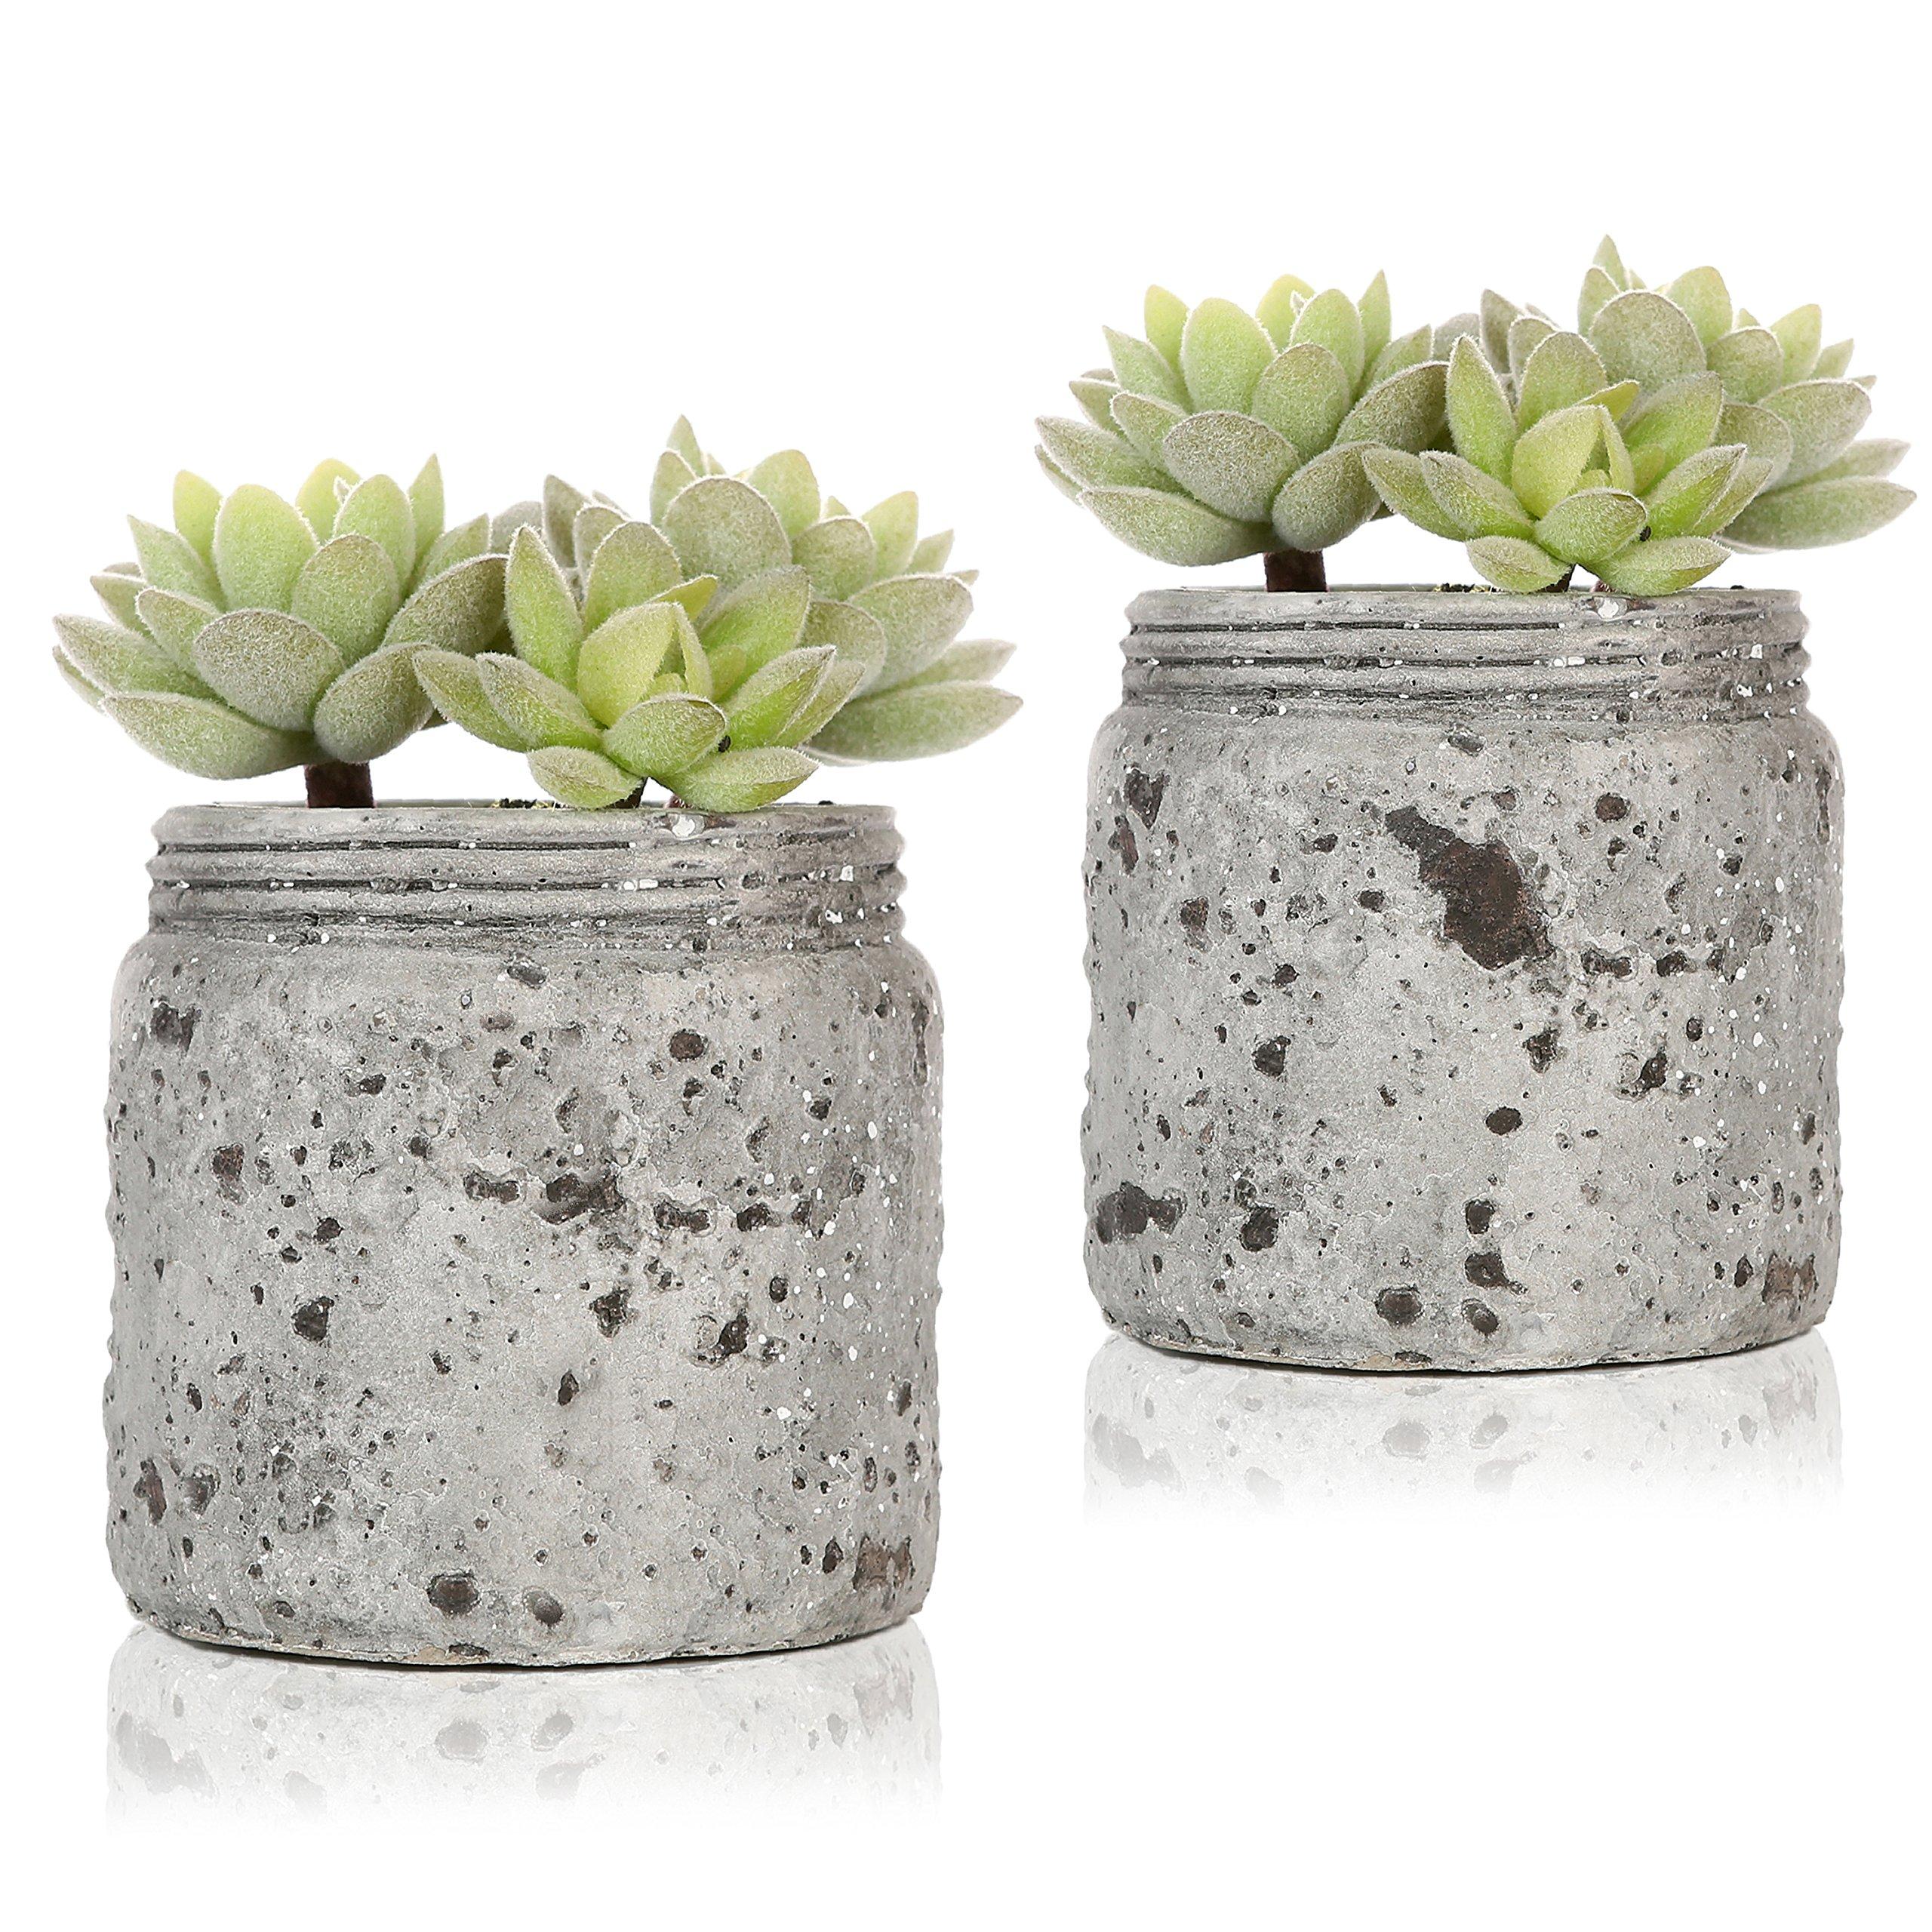 Mini Realistic Artificial Green Succulent Plants in Vintage Distressed Gray Ceramic Jar Pot, Set of 2